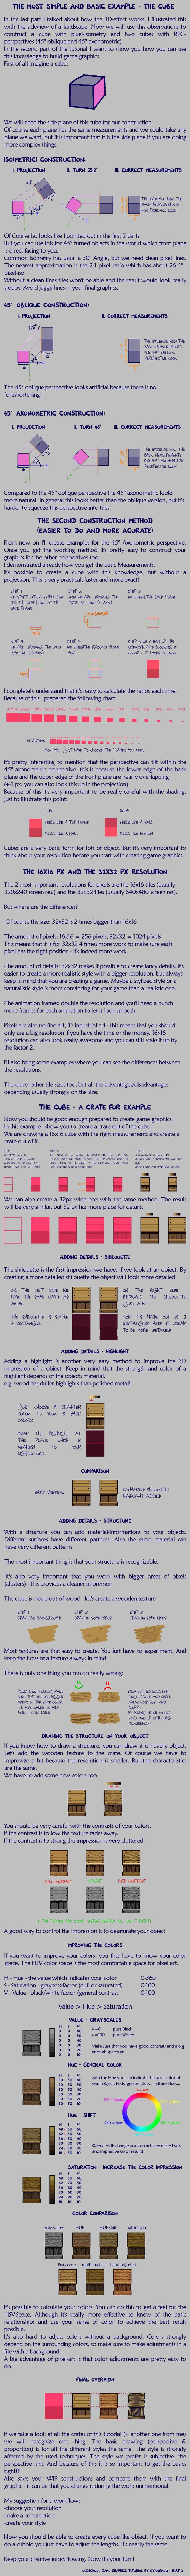 Pixel Art Tutorial 3 - The 'perfect' crate by Cyangmou.deviantart.com on @DeviantArt